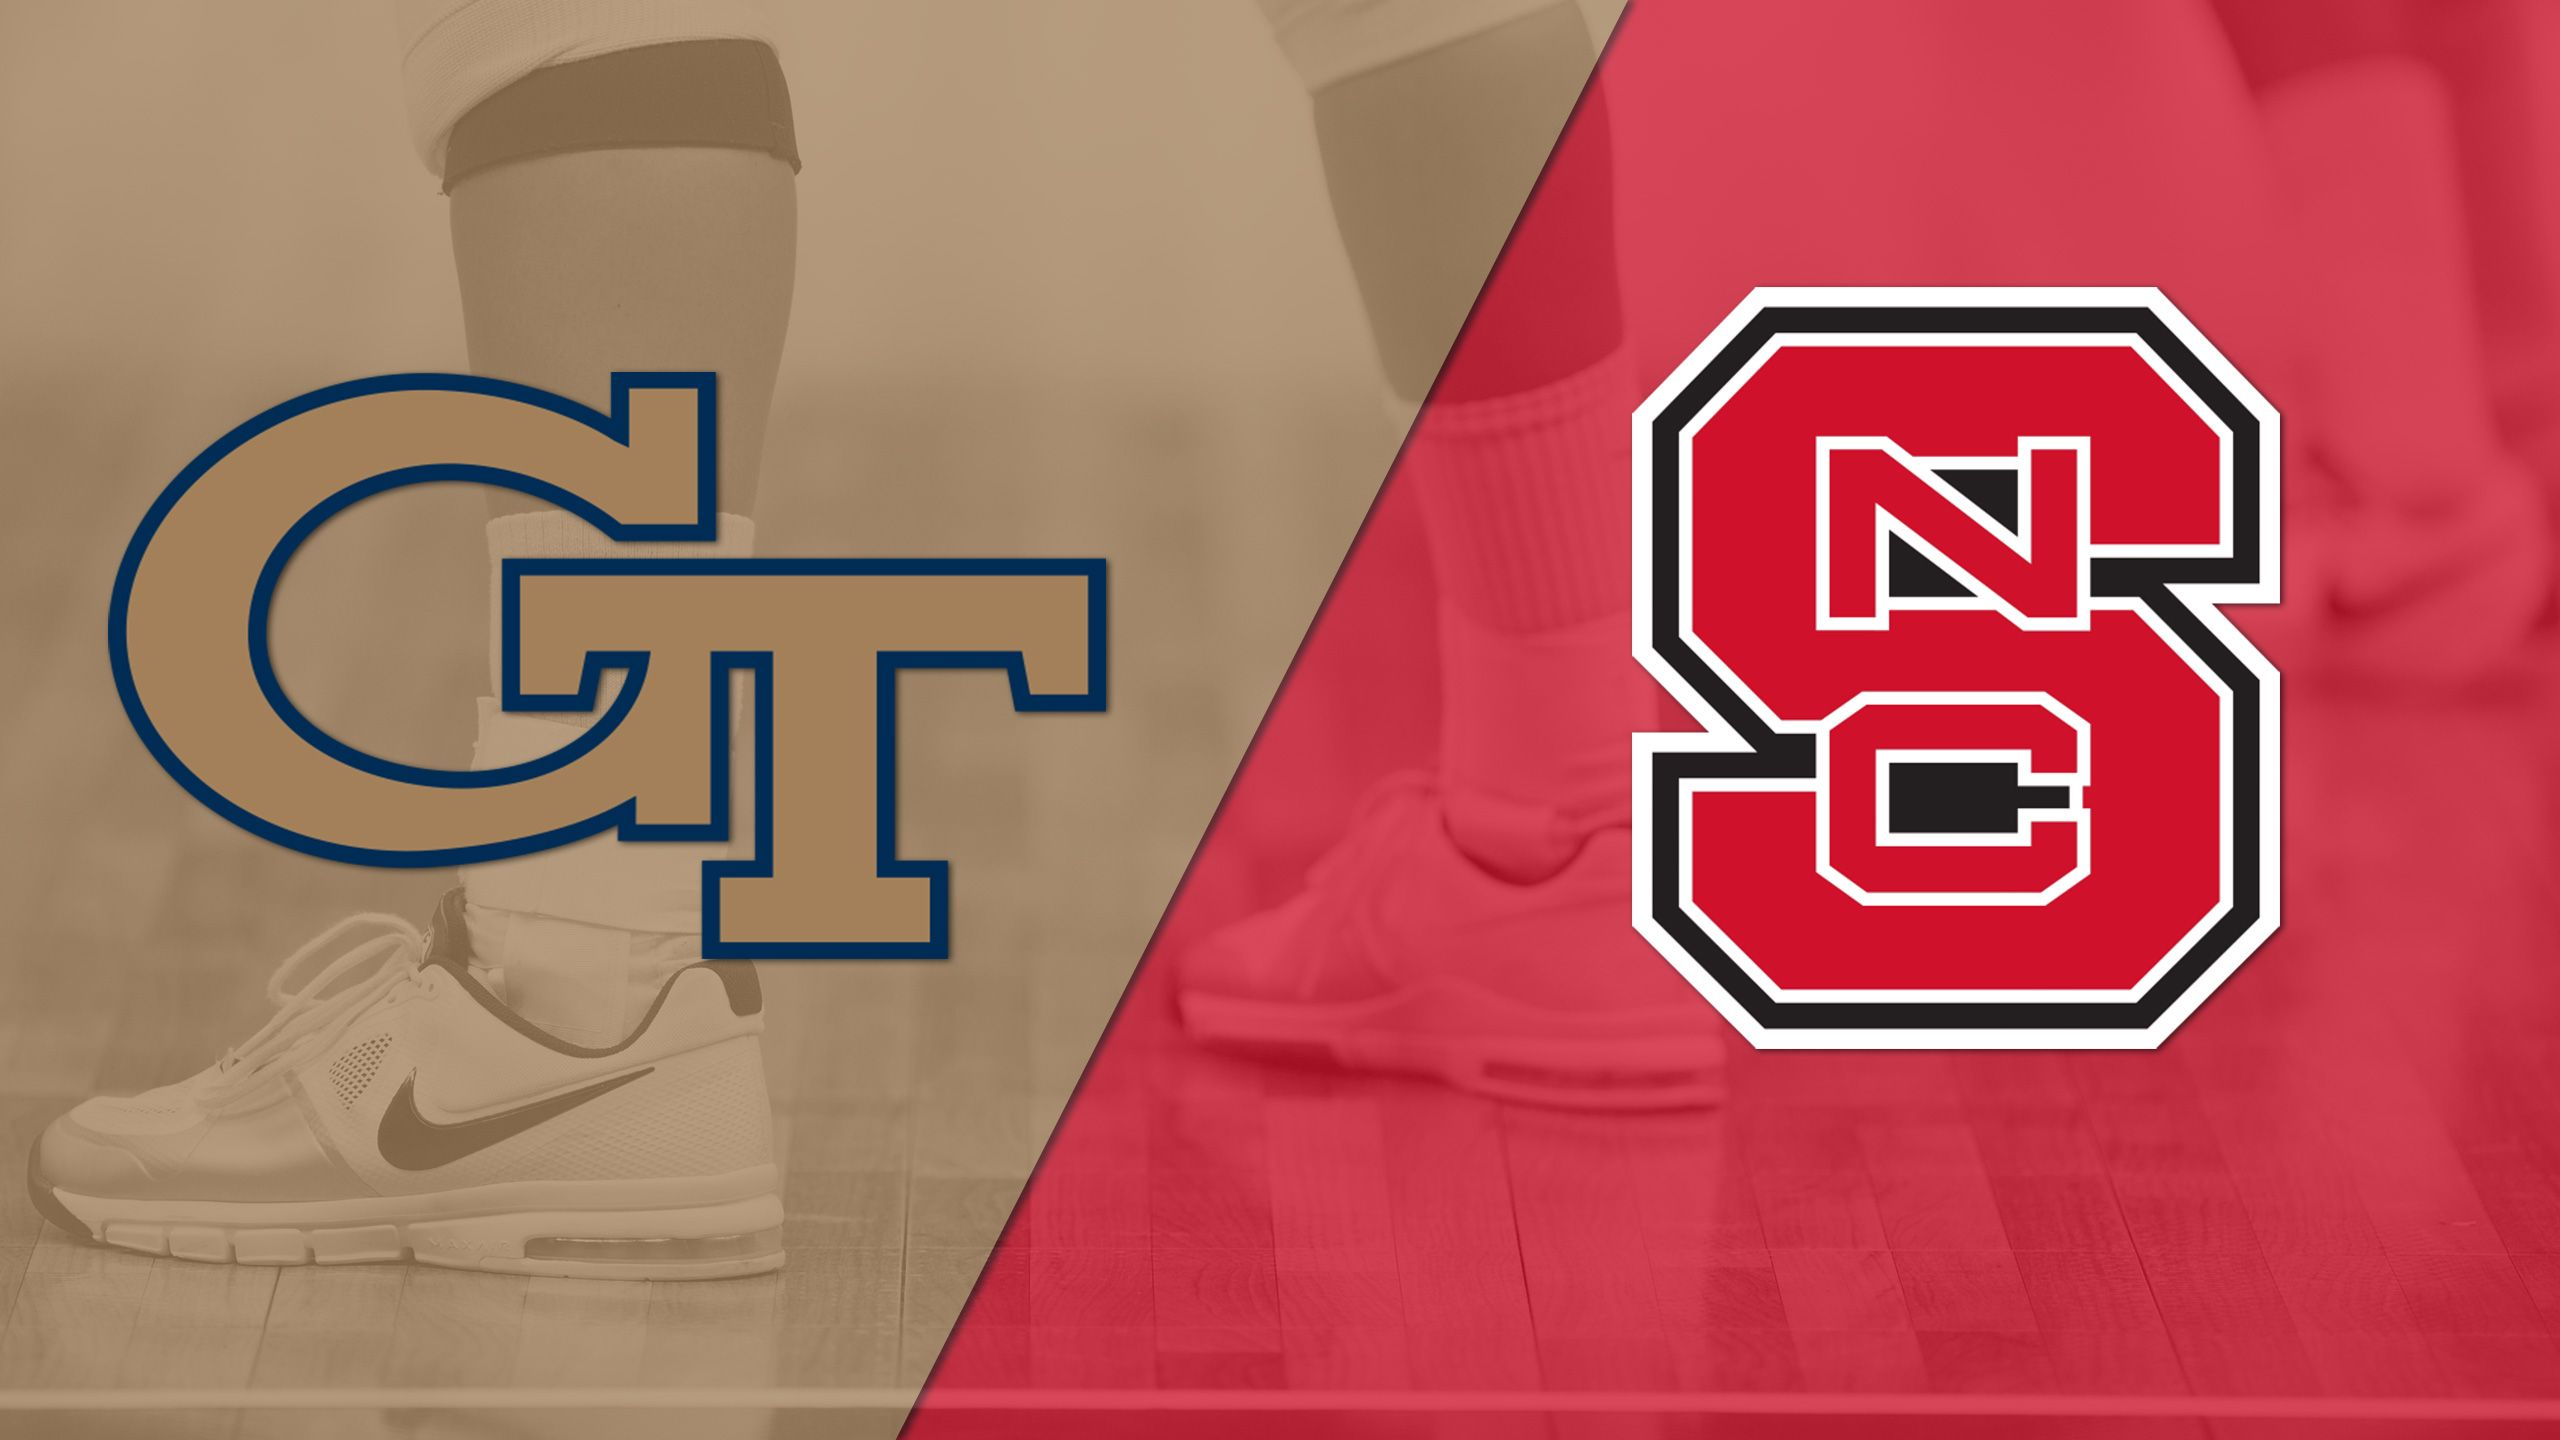 Georgia Tech vs. NC State (W Volleyball)